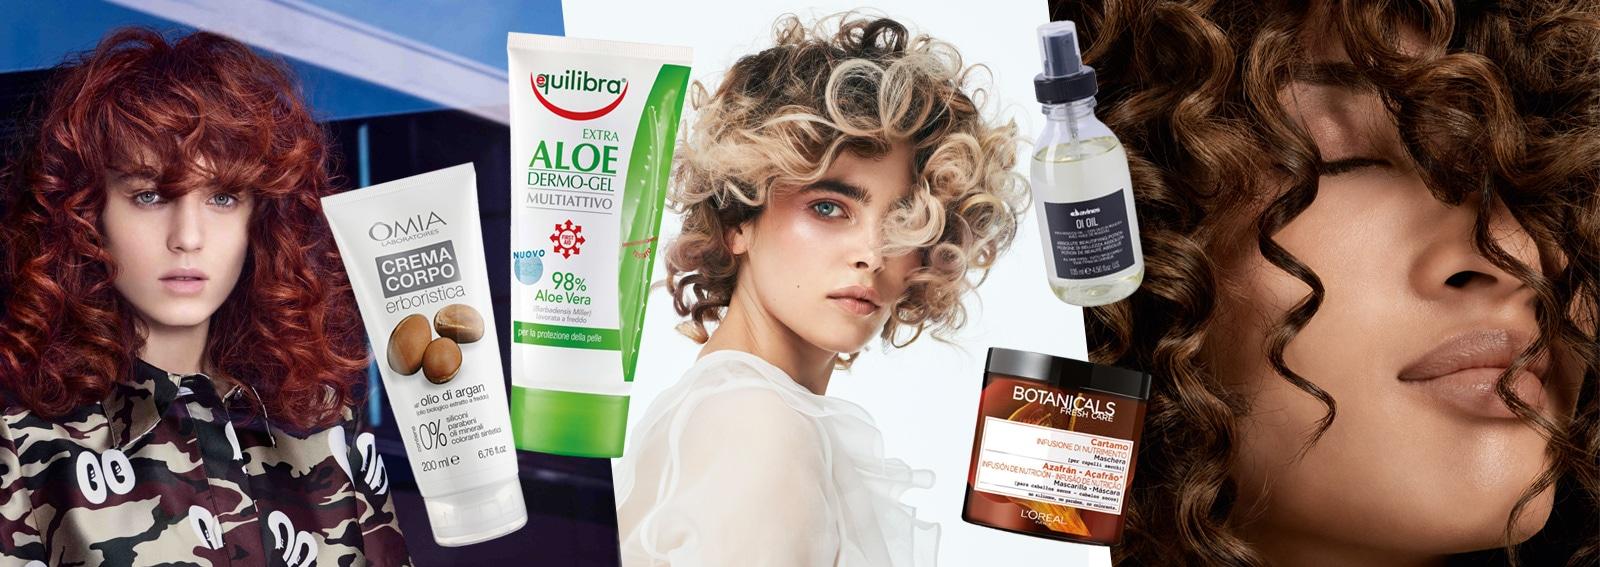 Schiuma per capelli ricci kerastase